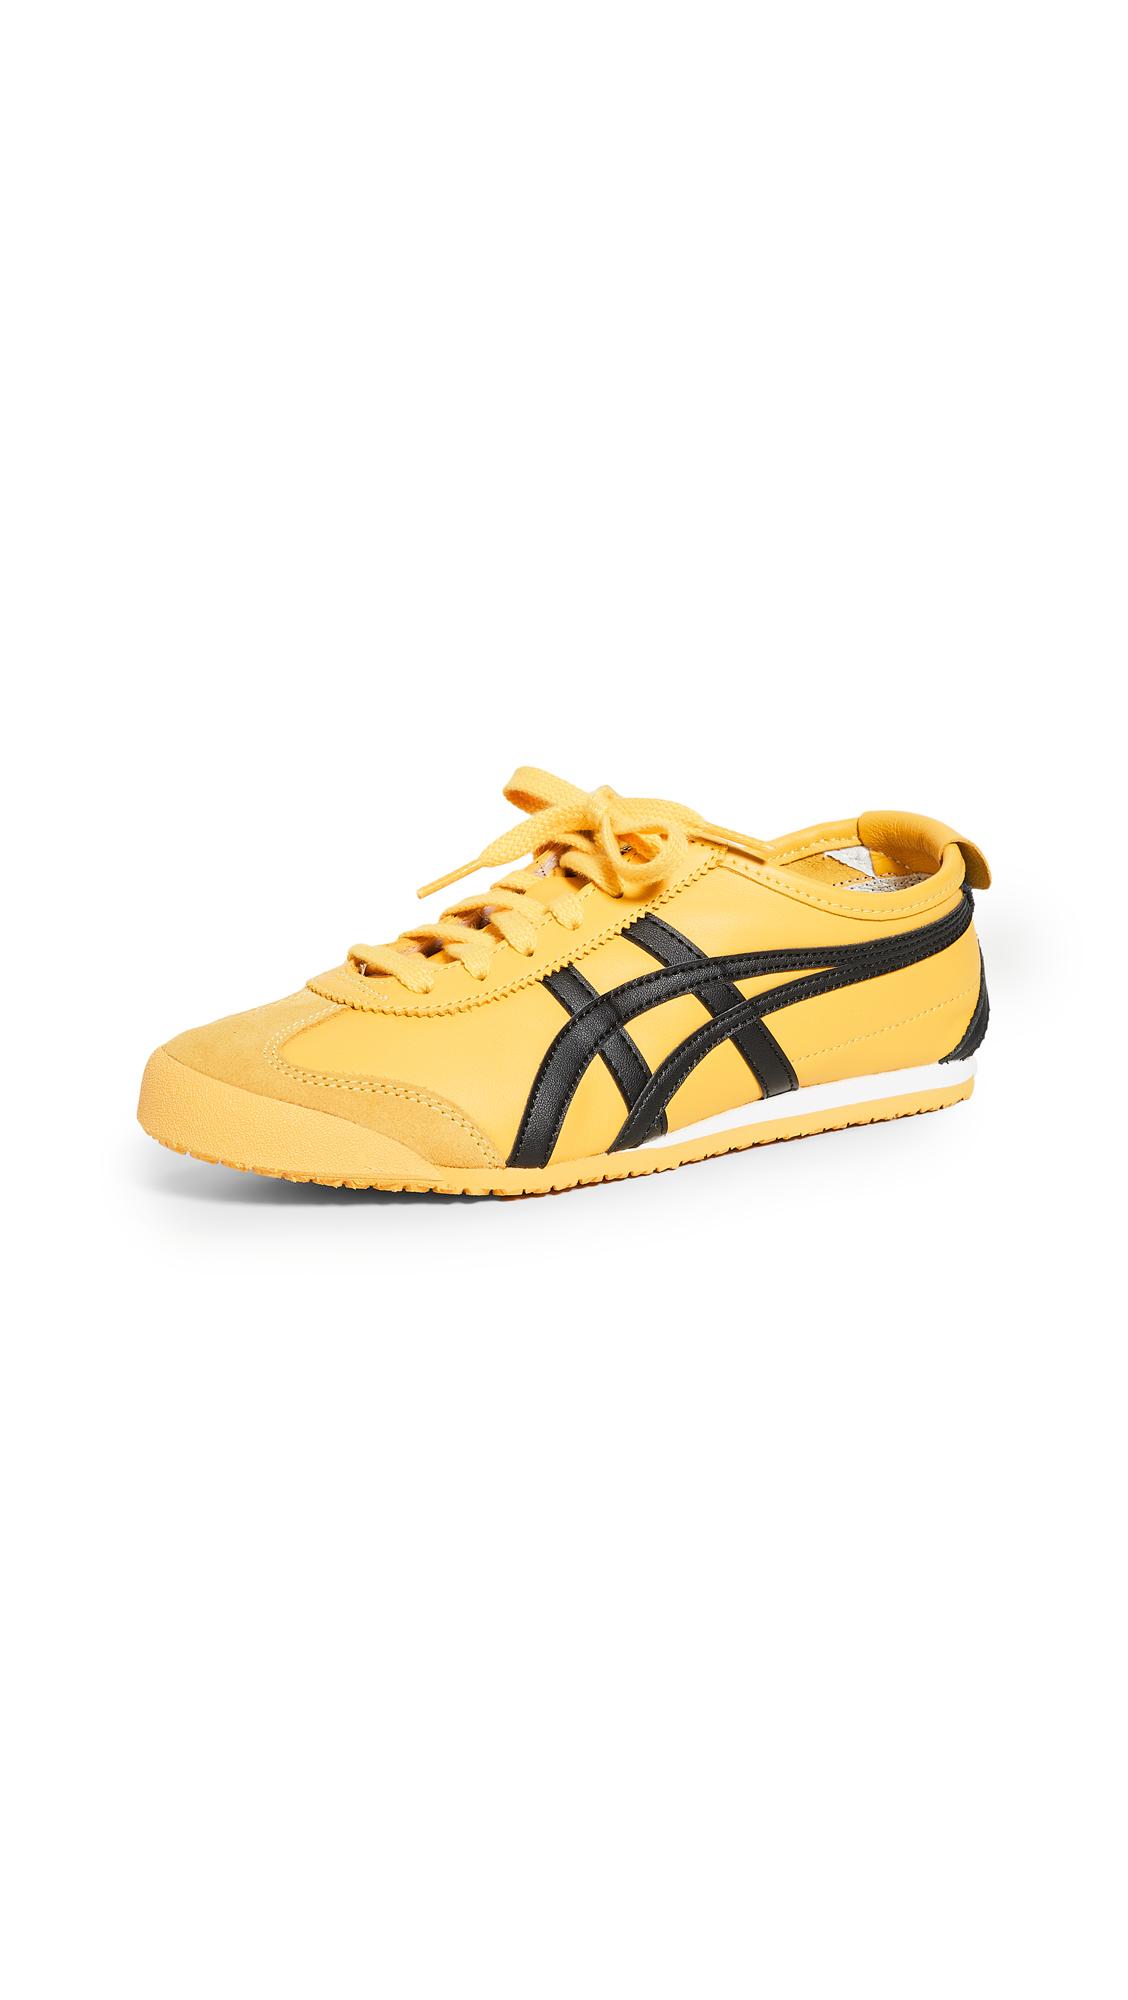 Asics Mexico 66 Sneakers - Yellow/Black